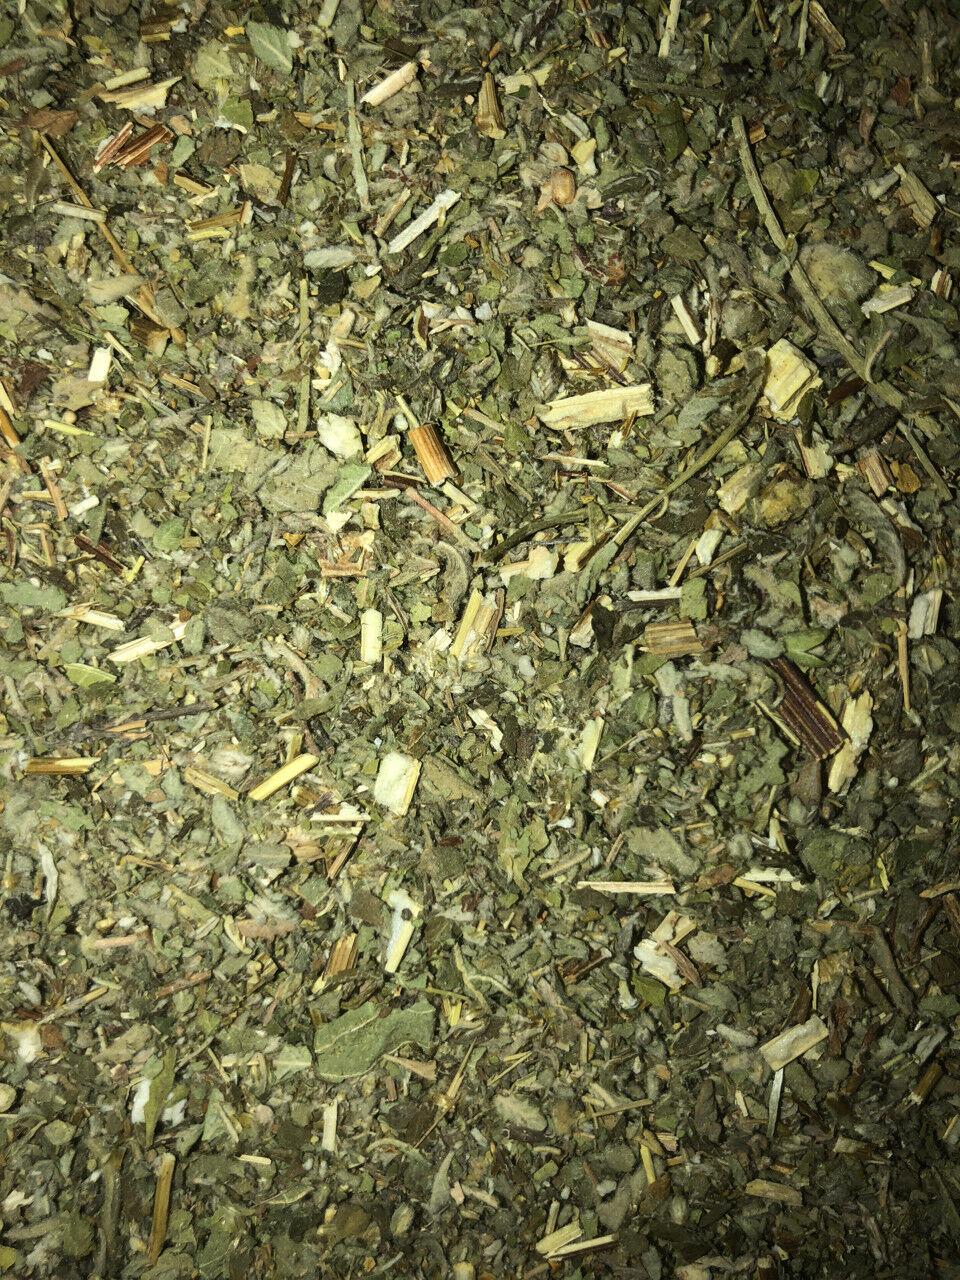 Damiana Marshmallow Mugwort Blend - 1/2 Lb Pound Natural Herb Mix Ships Fast - $22.92